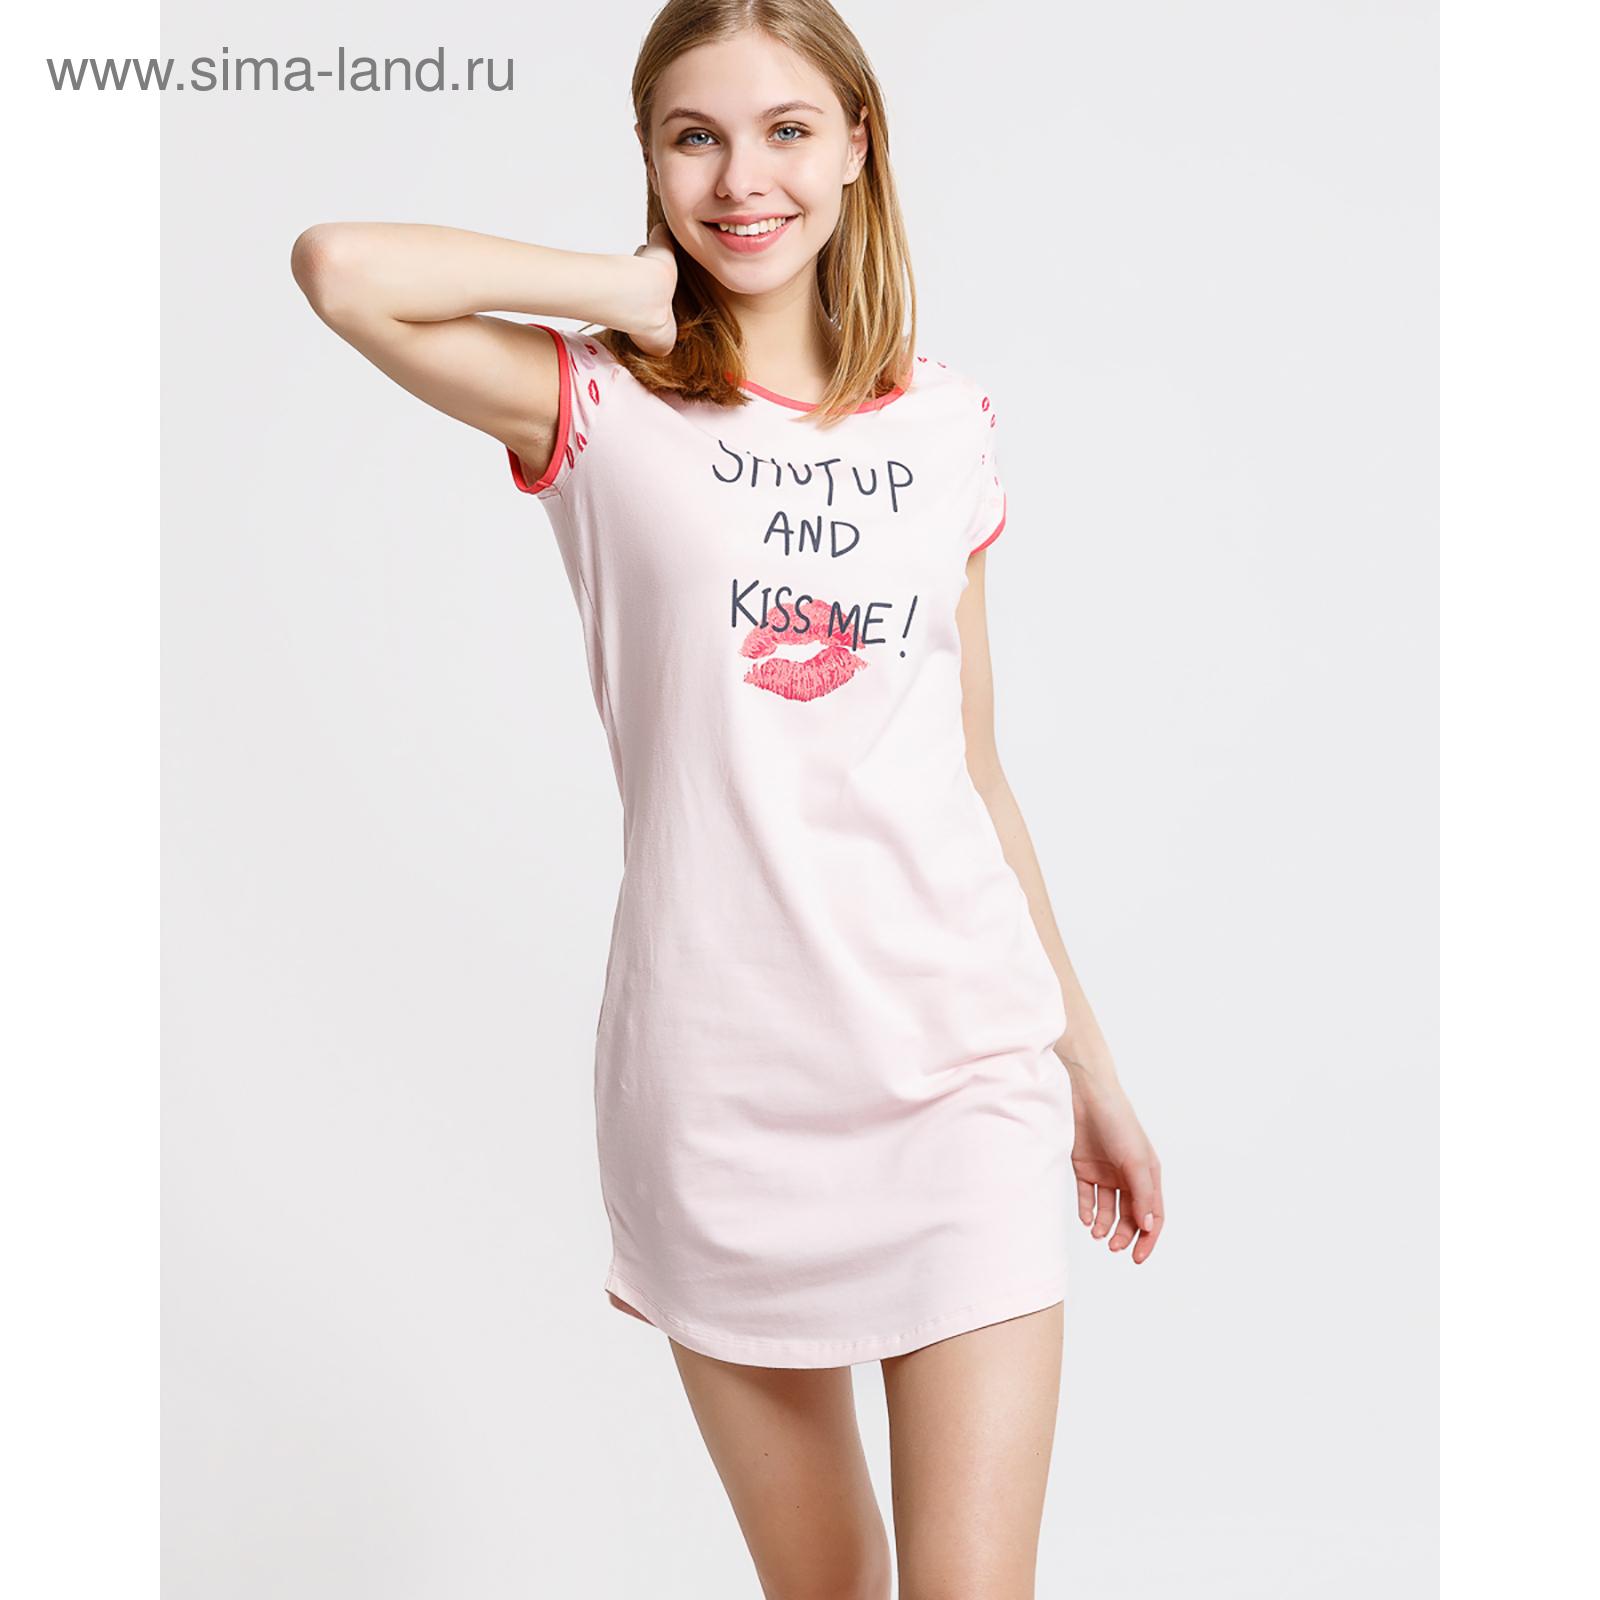 dea6ad49d24a546 Сорочка женская 1023-5 (572307) цвет розовый, р-р 52 (XXL) (1023-5 ...